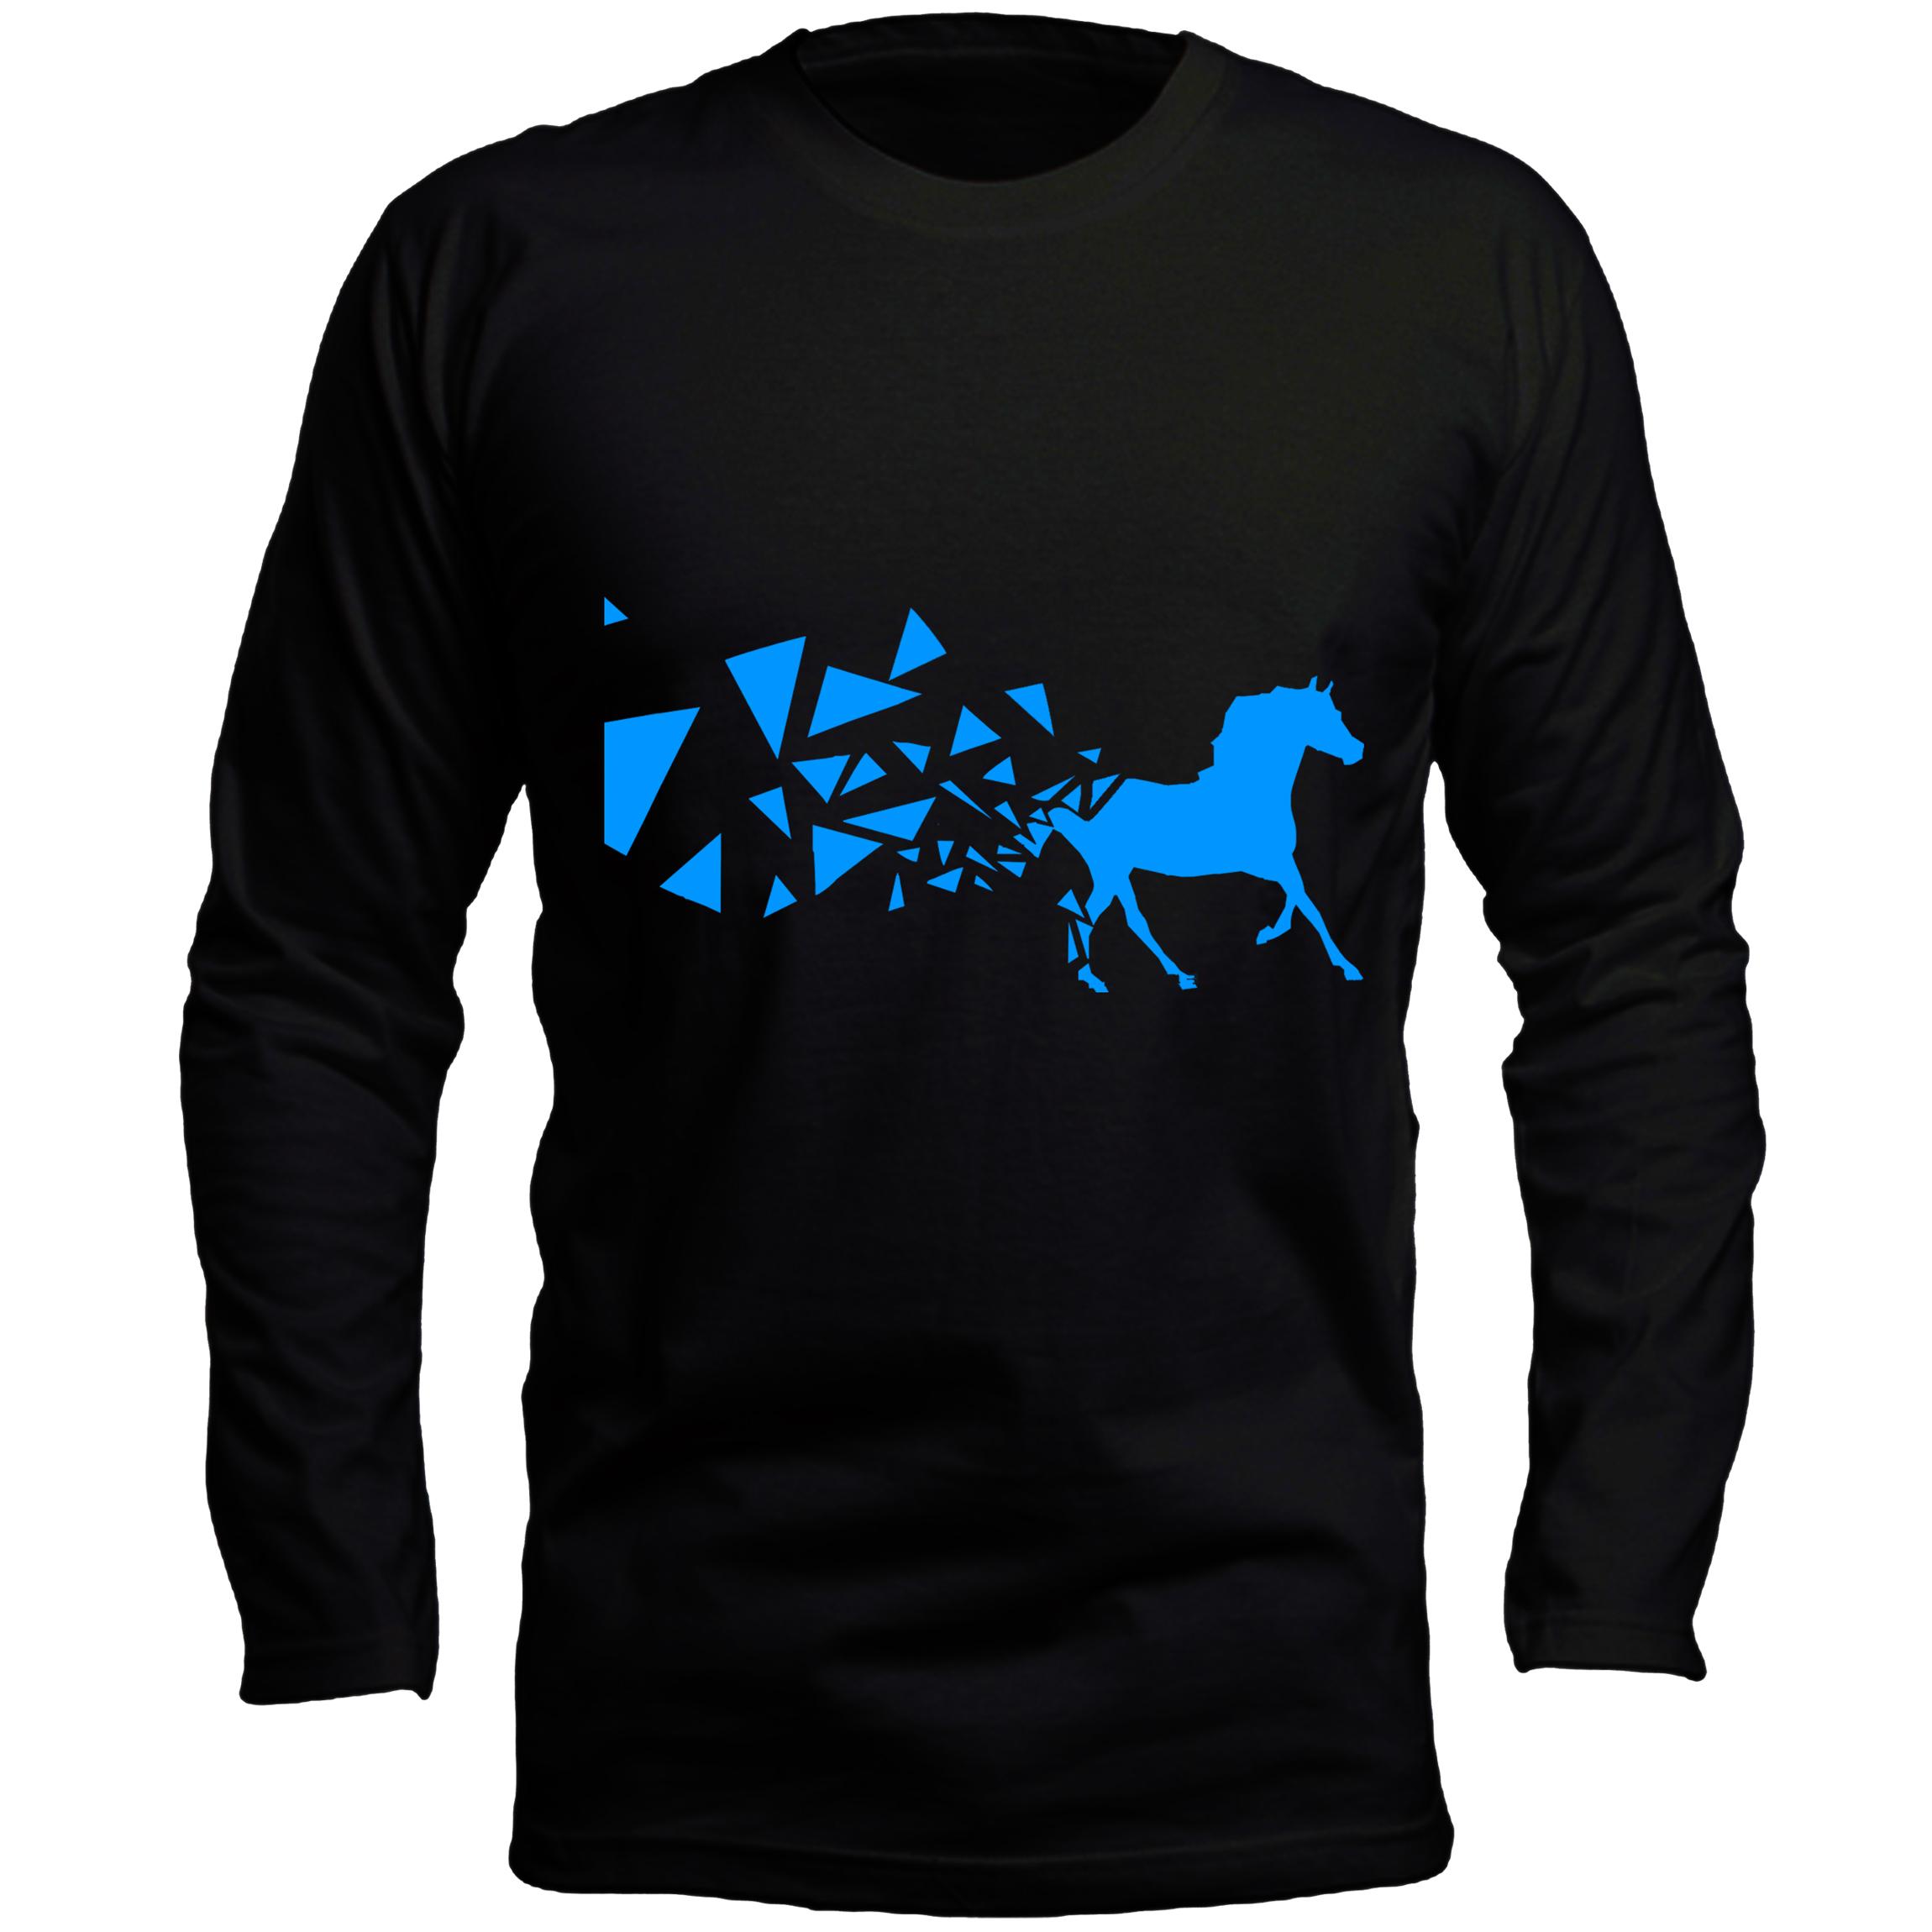 تیشرت آستین بلند مردانه طرح اسب کد LB176